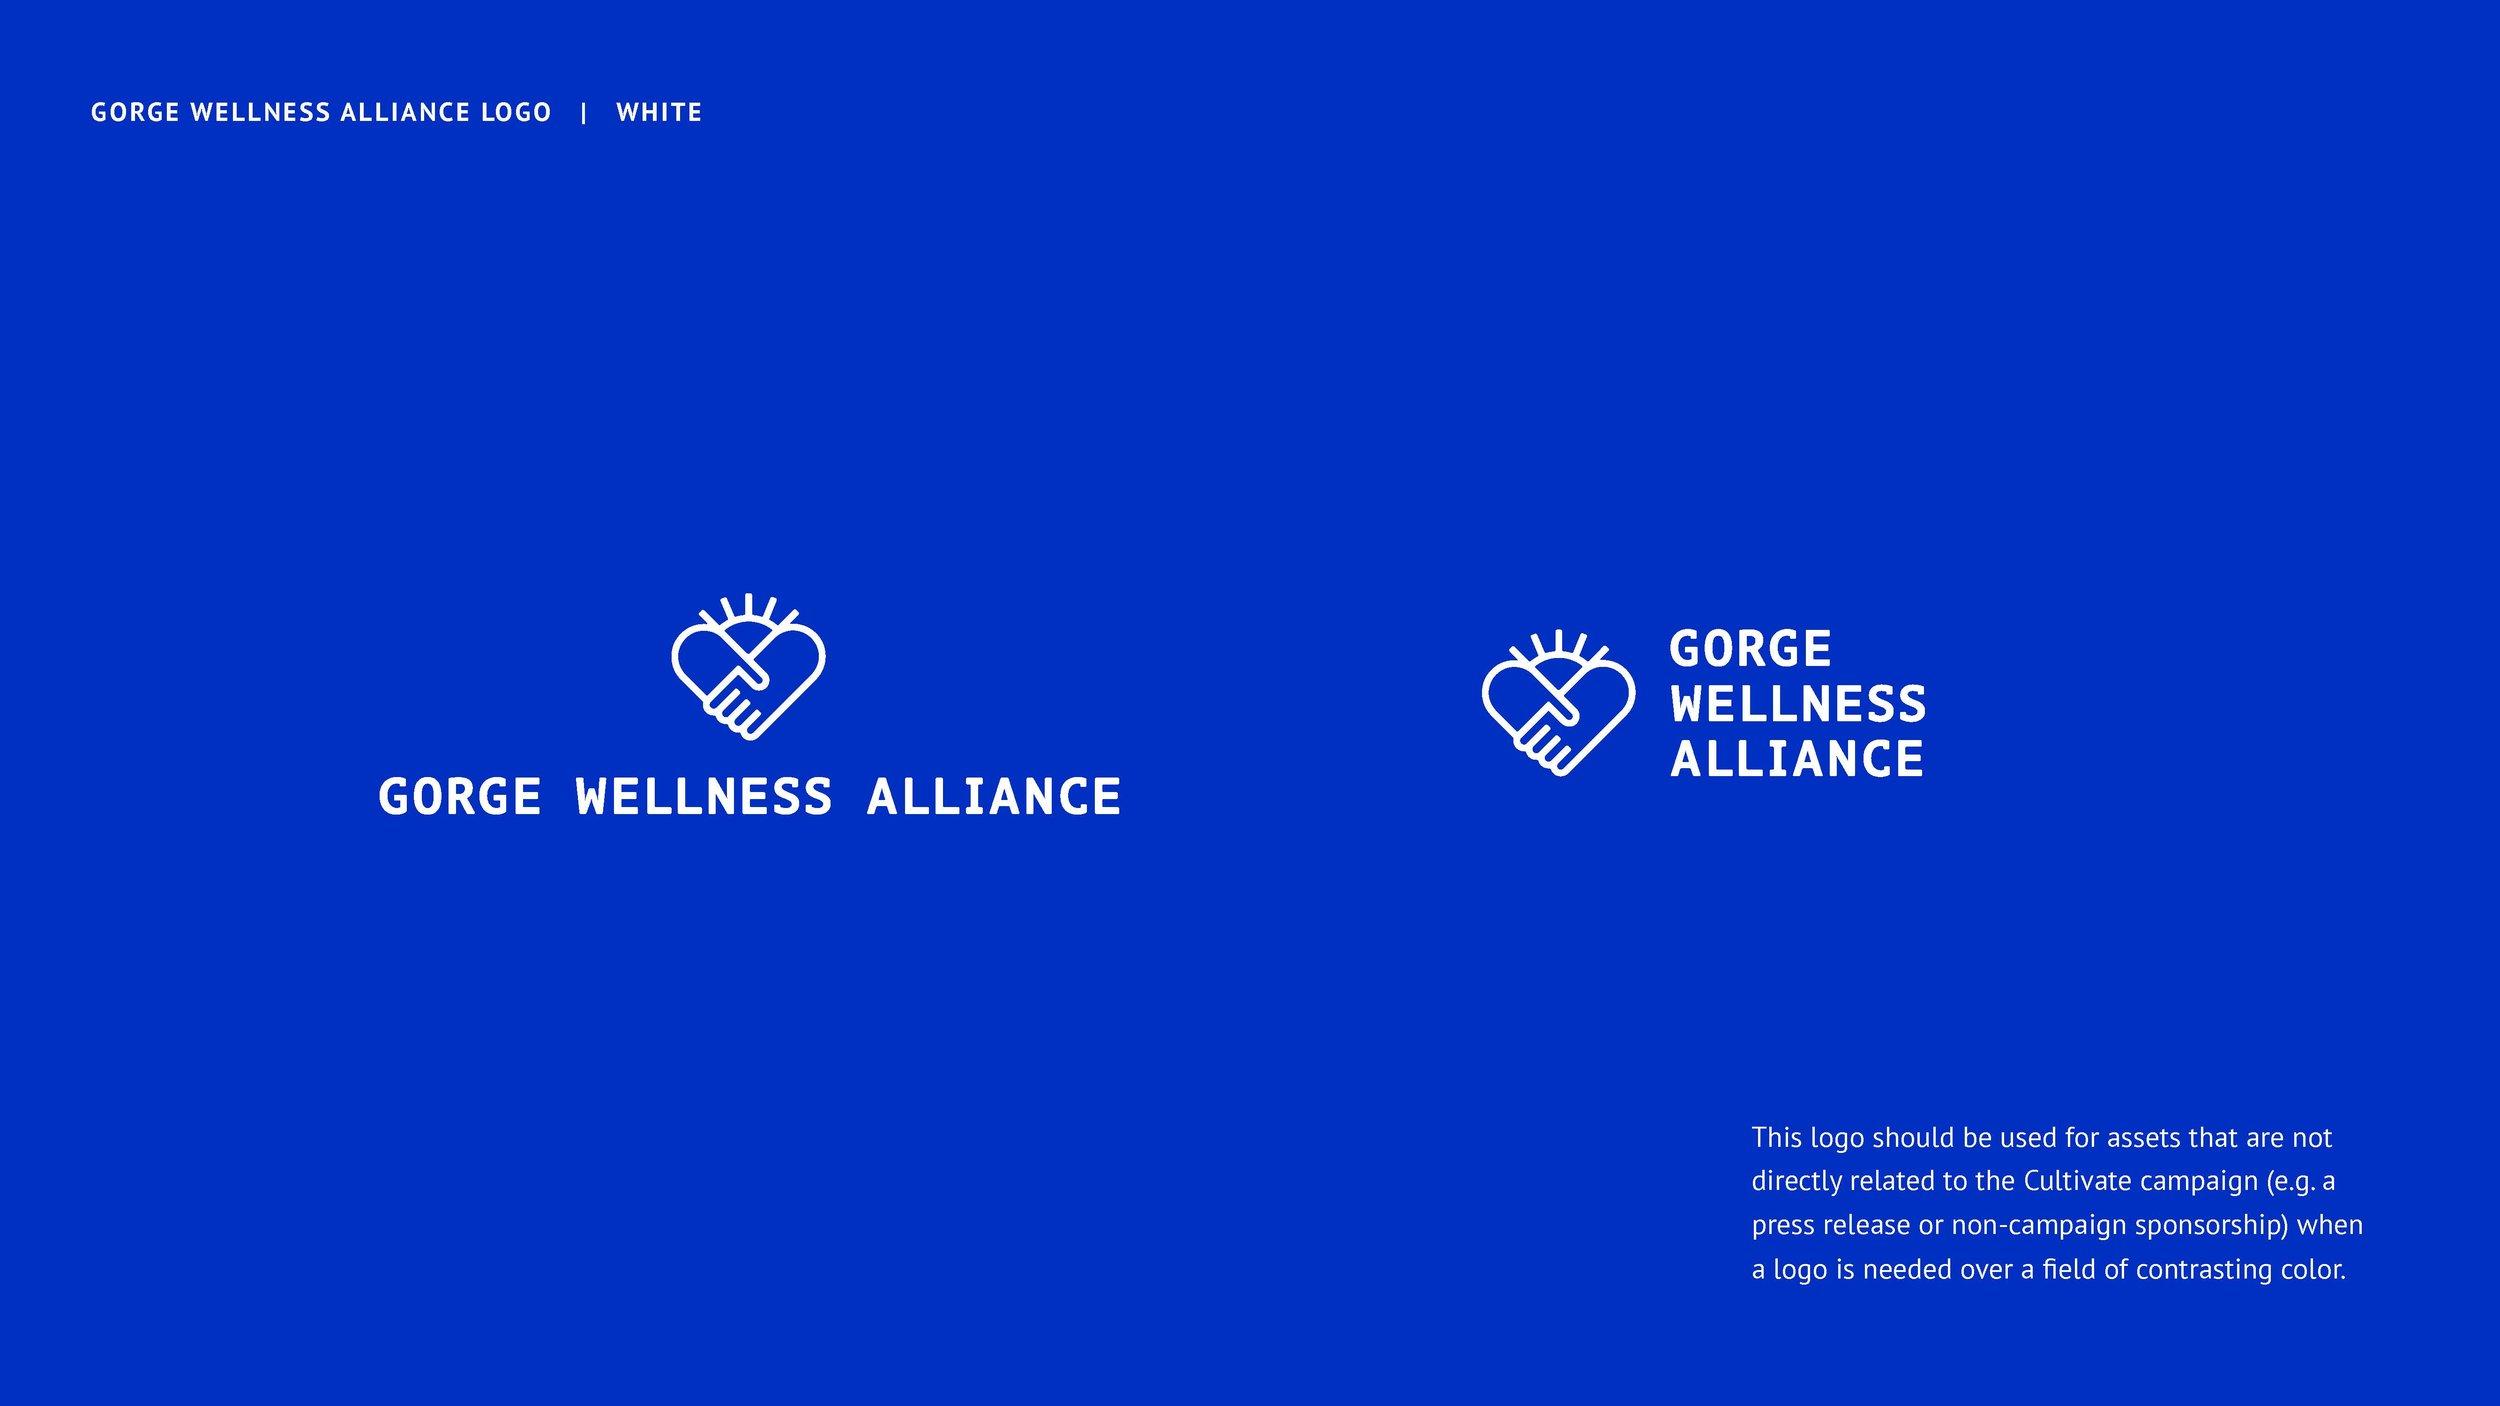 GWA_Brand Identity_Page_12.jpg